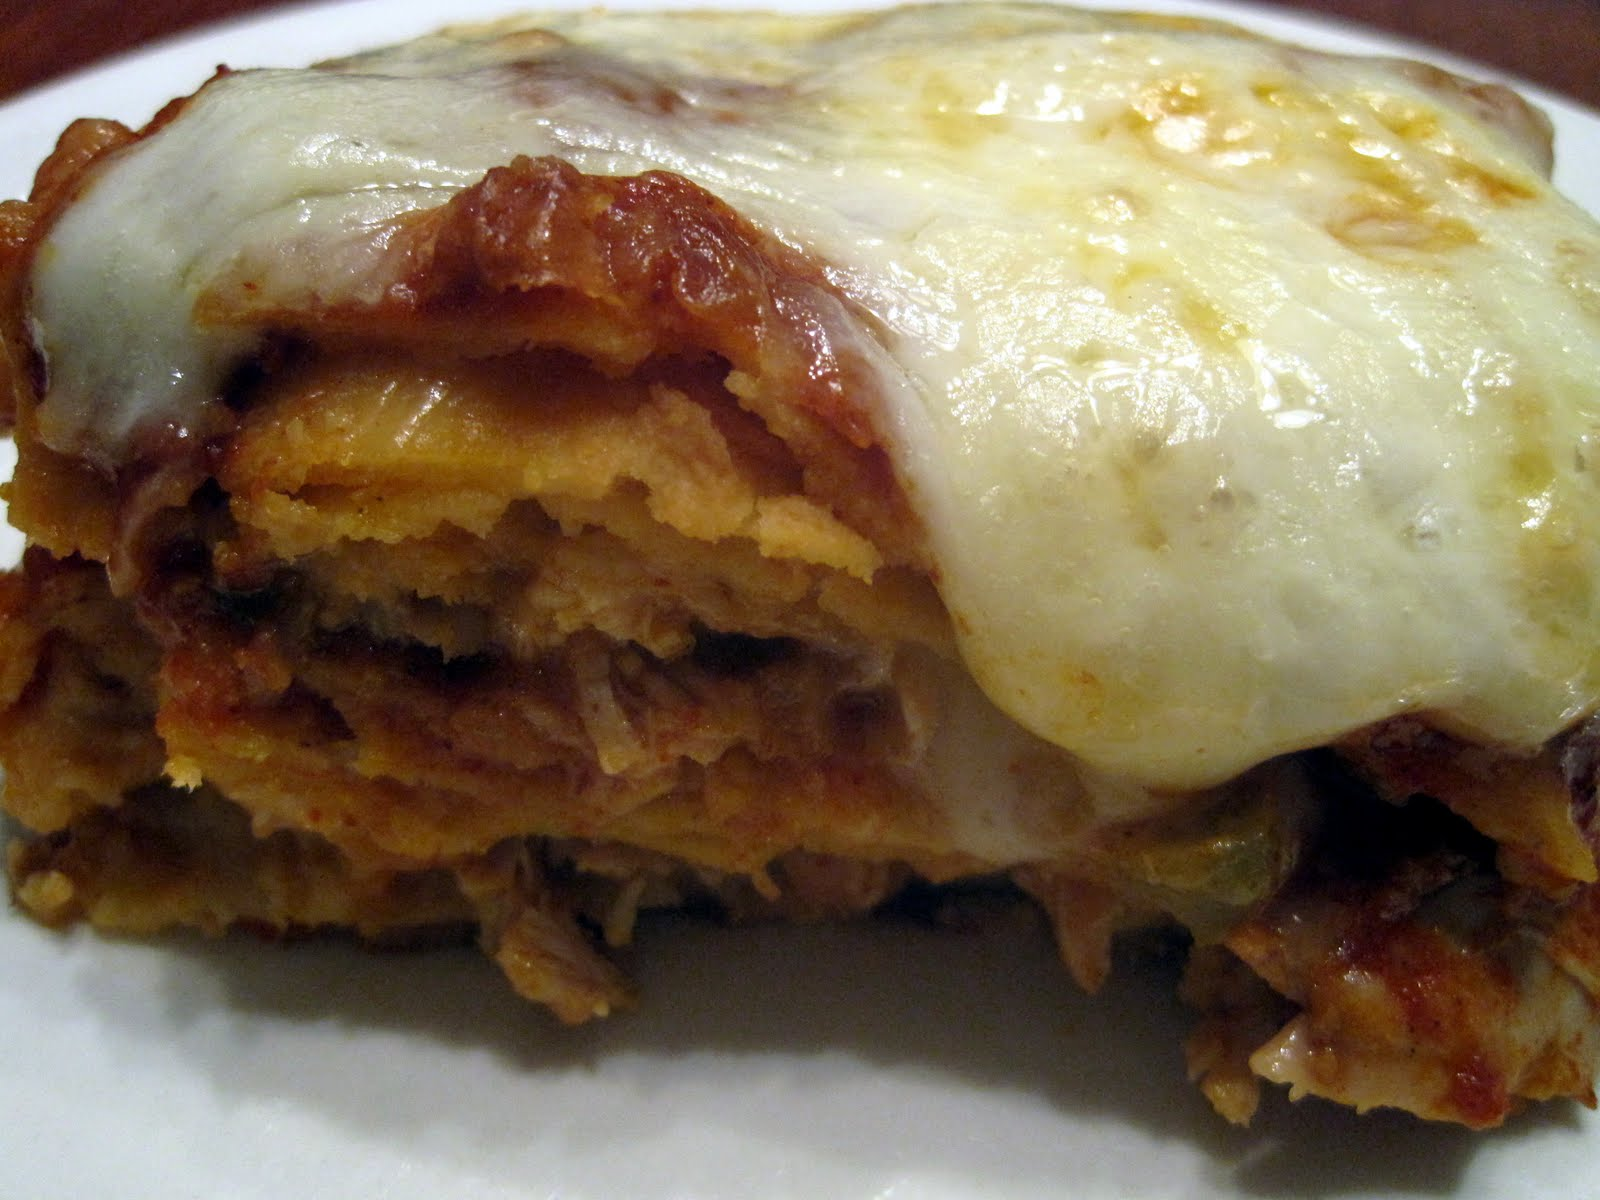 Lynda's Recipe Box: Stacked Chicken Enchiladas - an easy cassarole